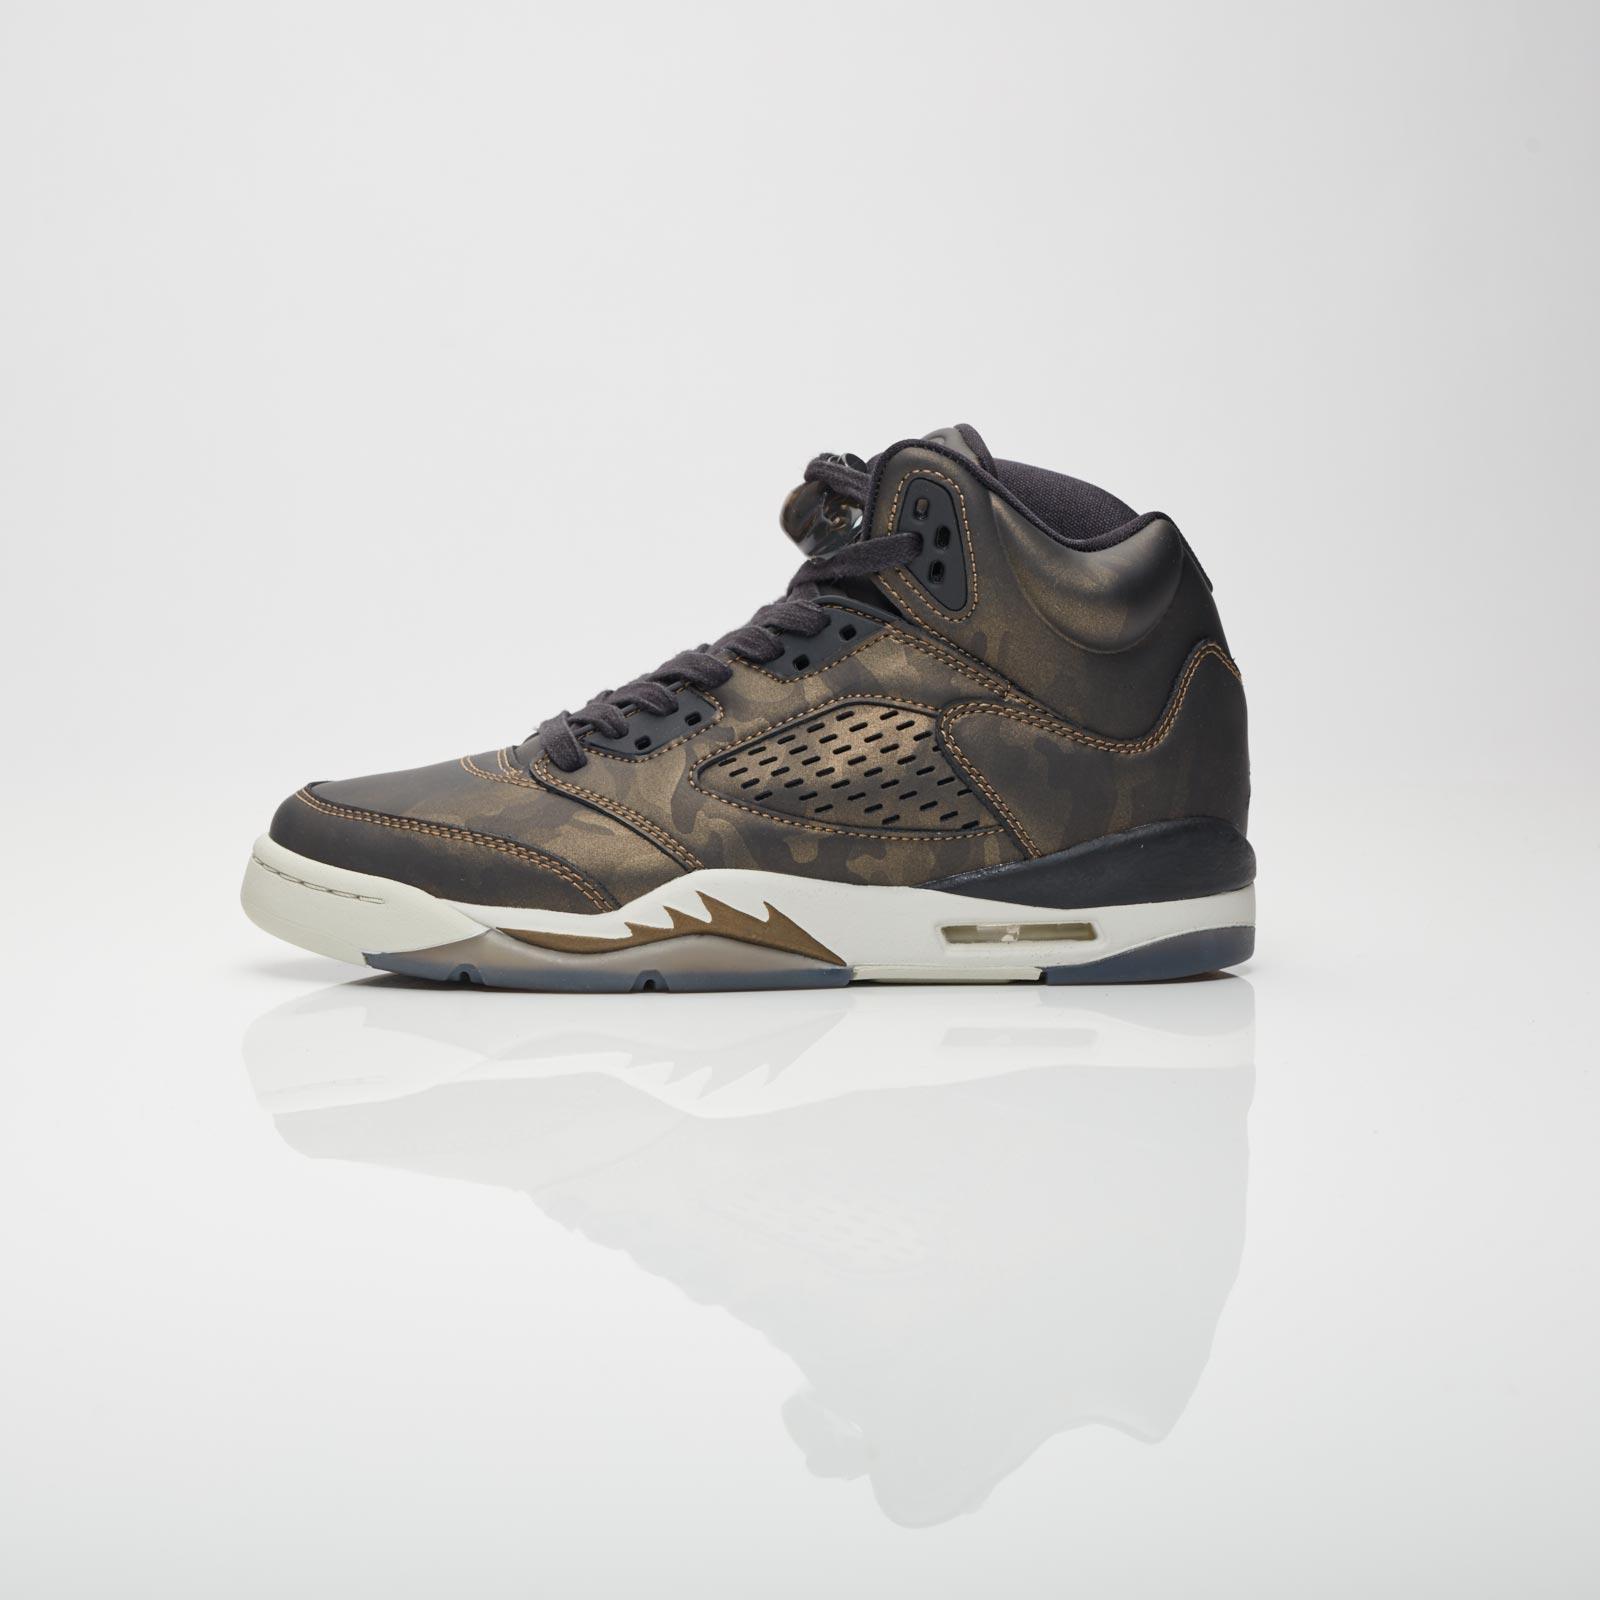 sports shoes a1c8f db351 Jordan Brand Air Jordan 5 Retro Premium HC - 919710-030 - Sneakersnstuff    sneakers   streetwear online since 1999